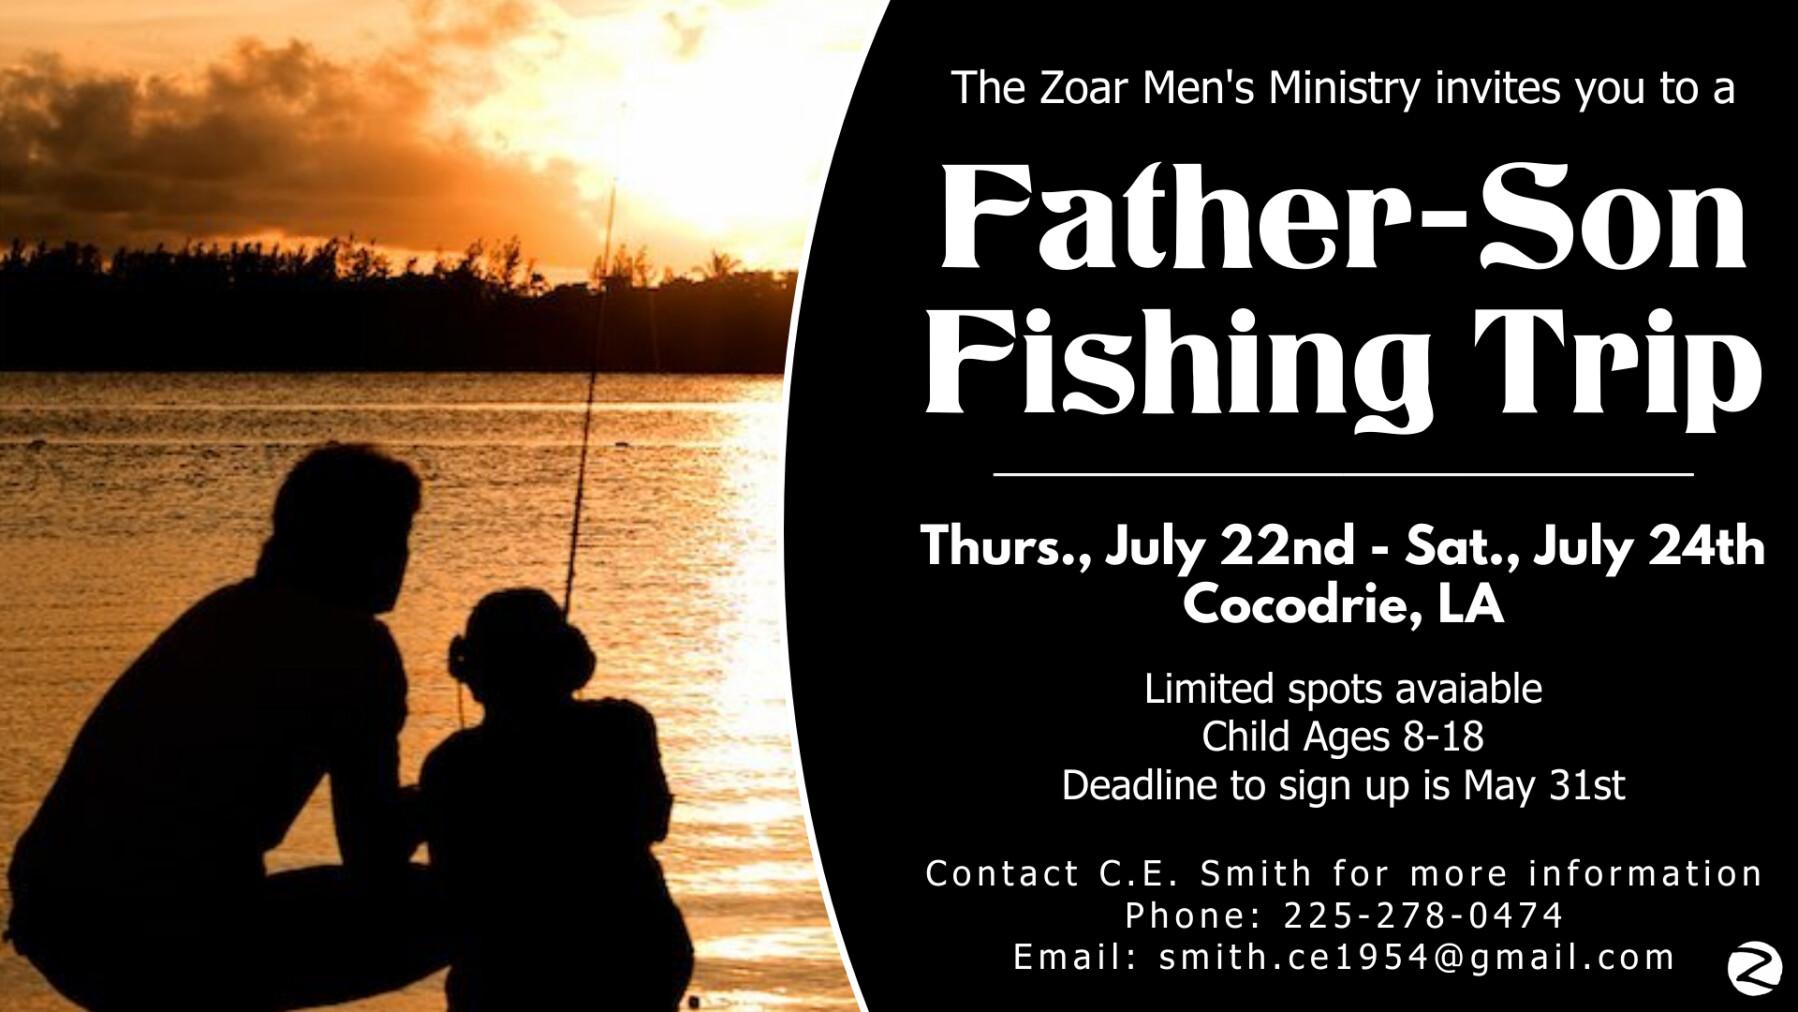 Father-Son Fishing Trip